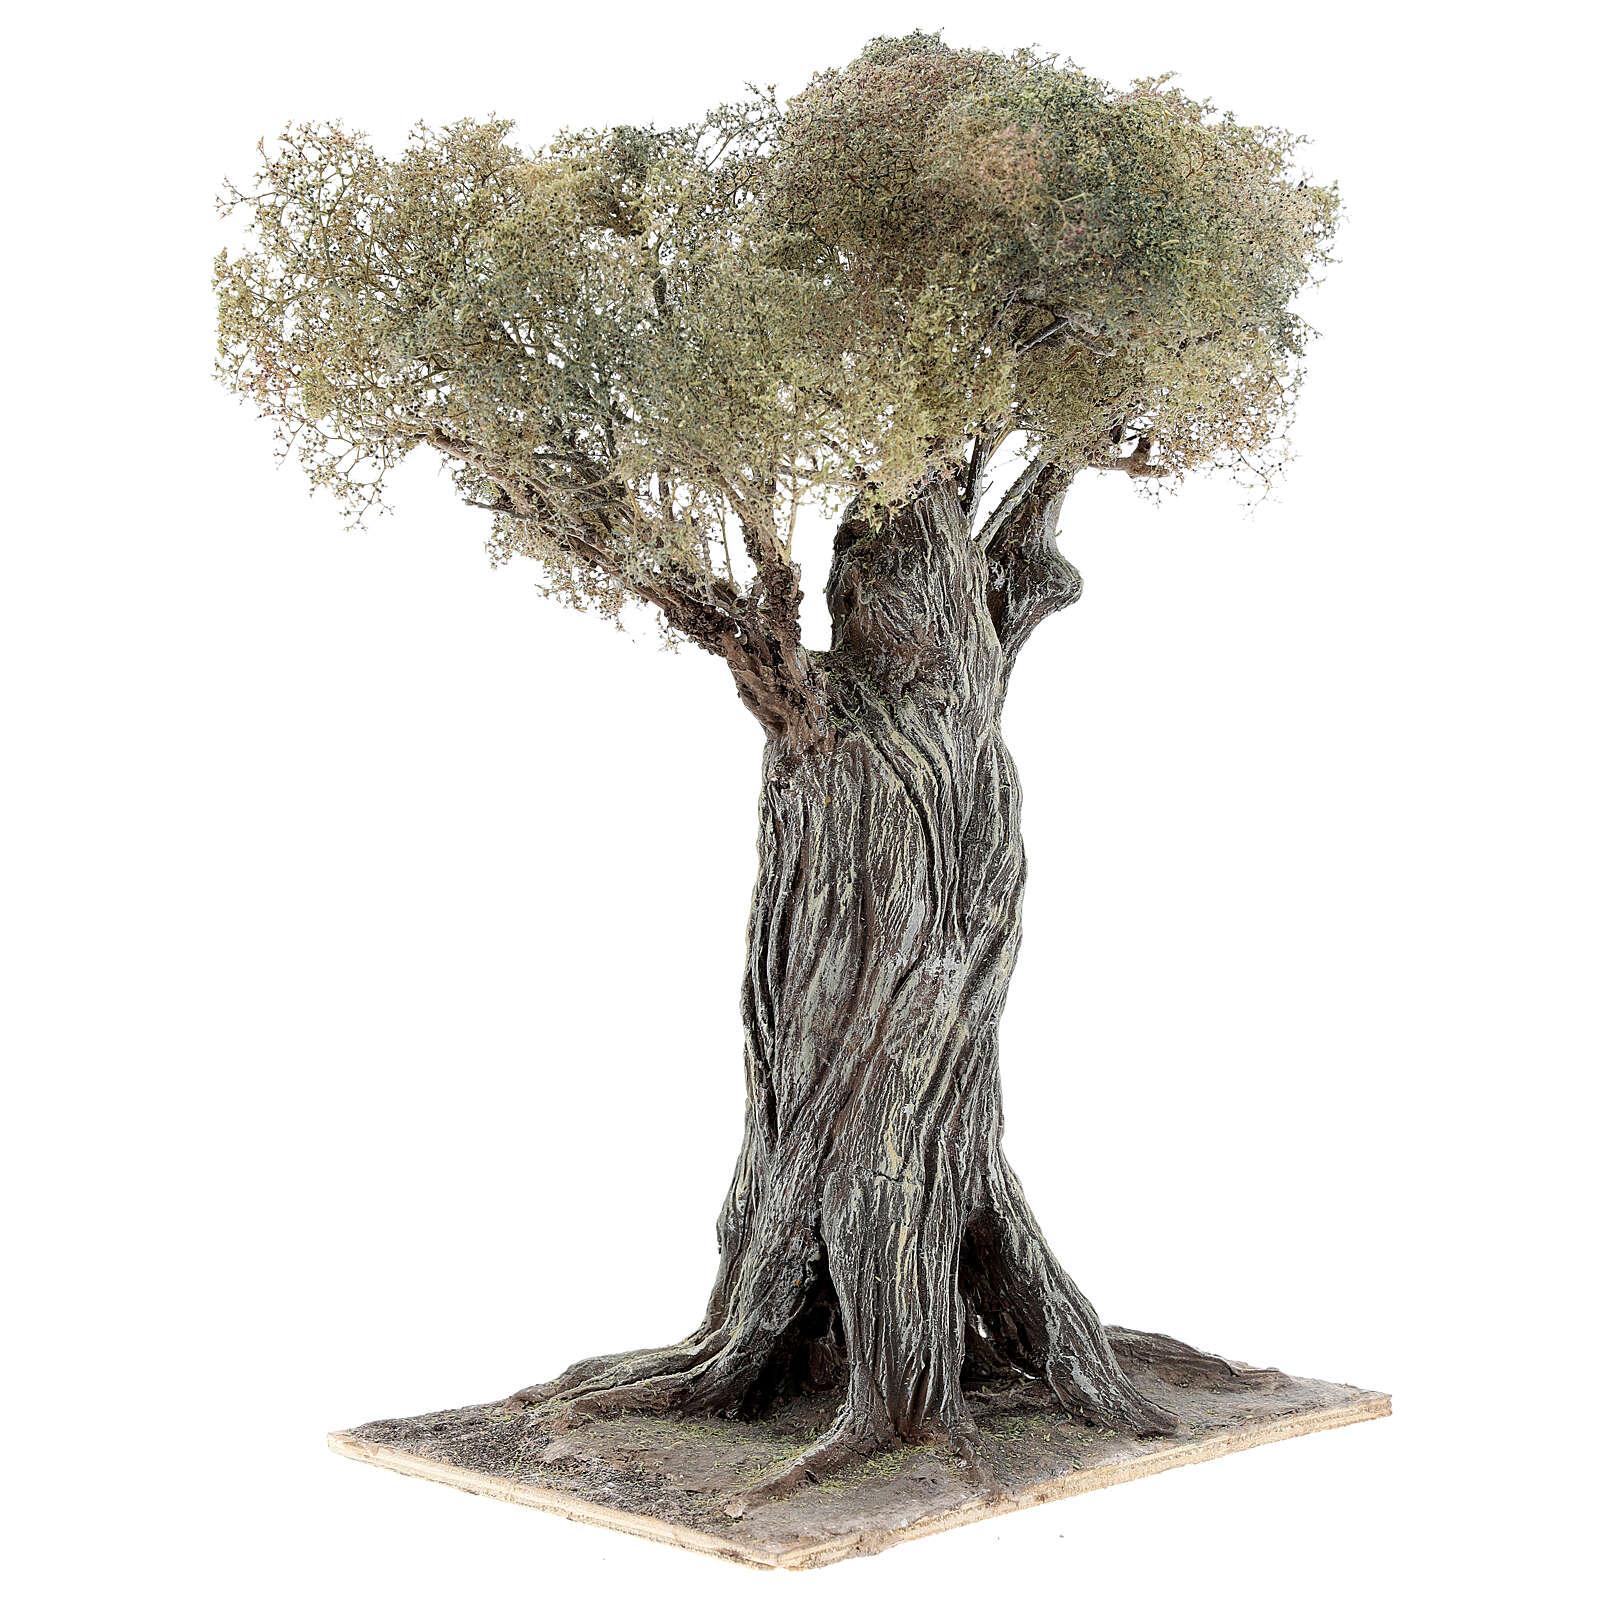 Miniature olive tree Neapolitan nativity scene 30 cm in papier mache wood 4